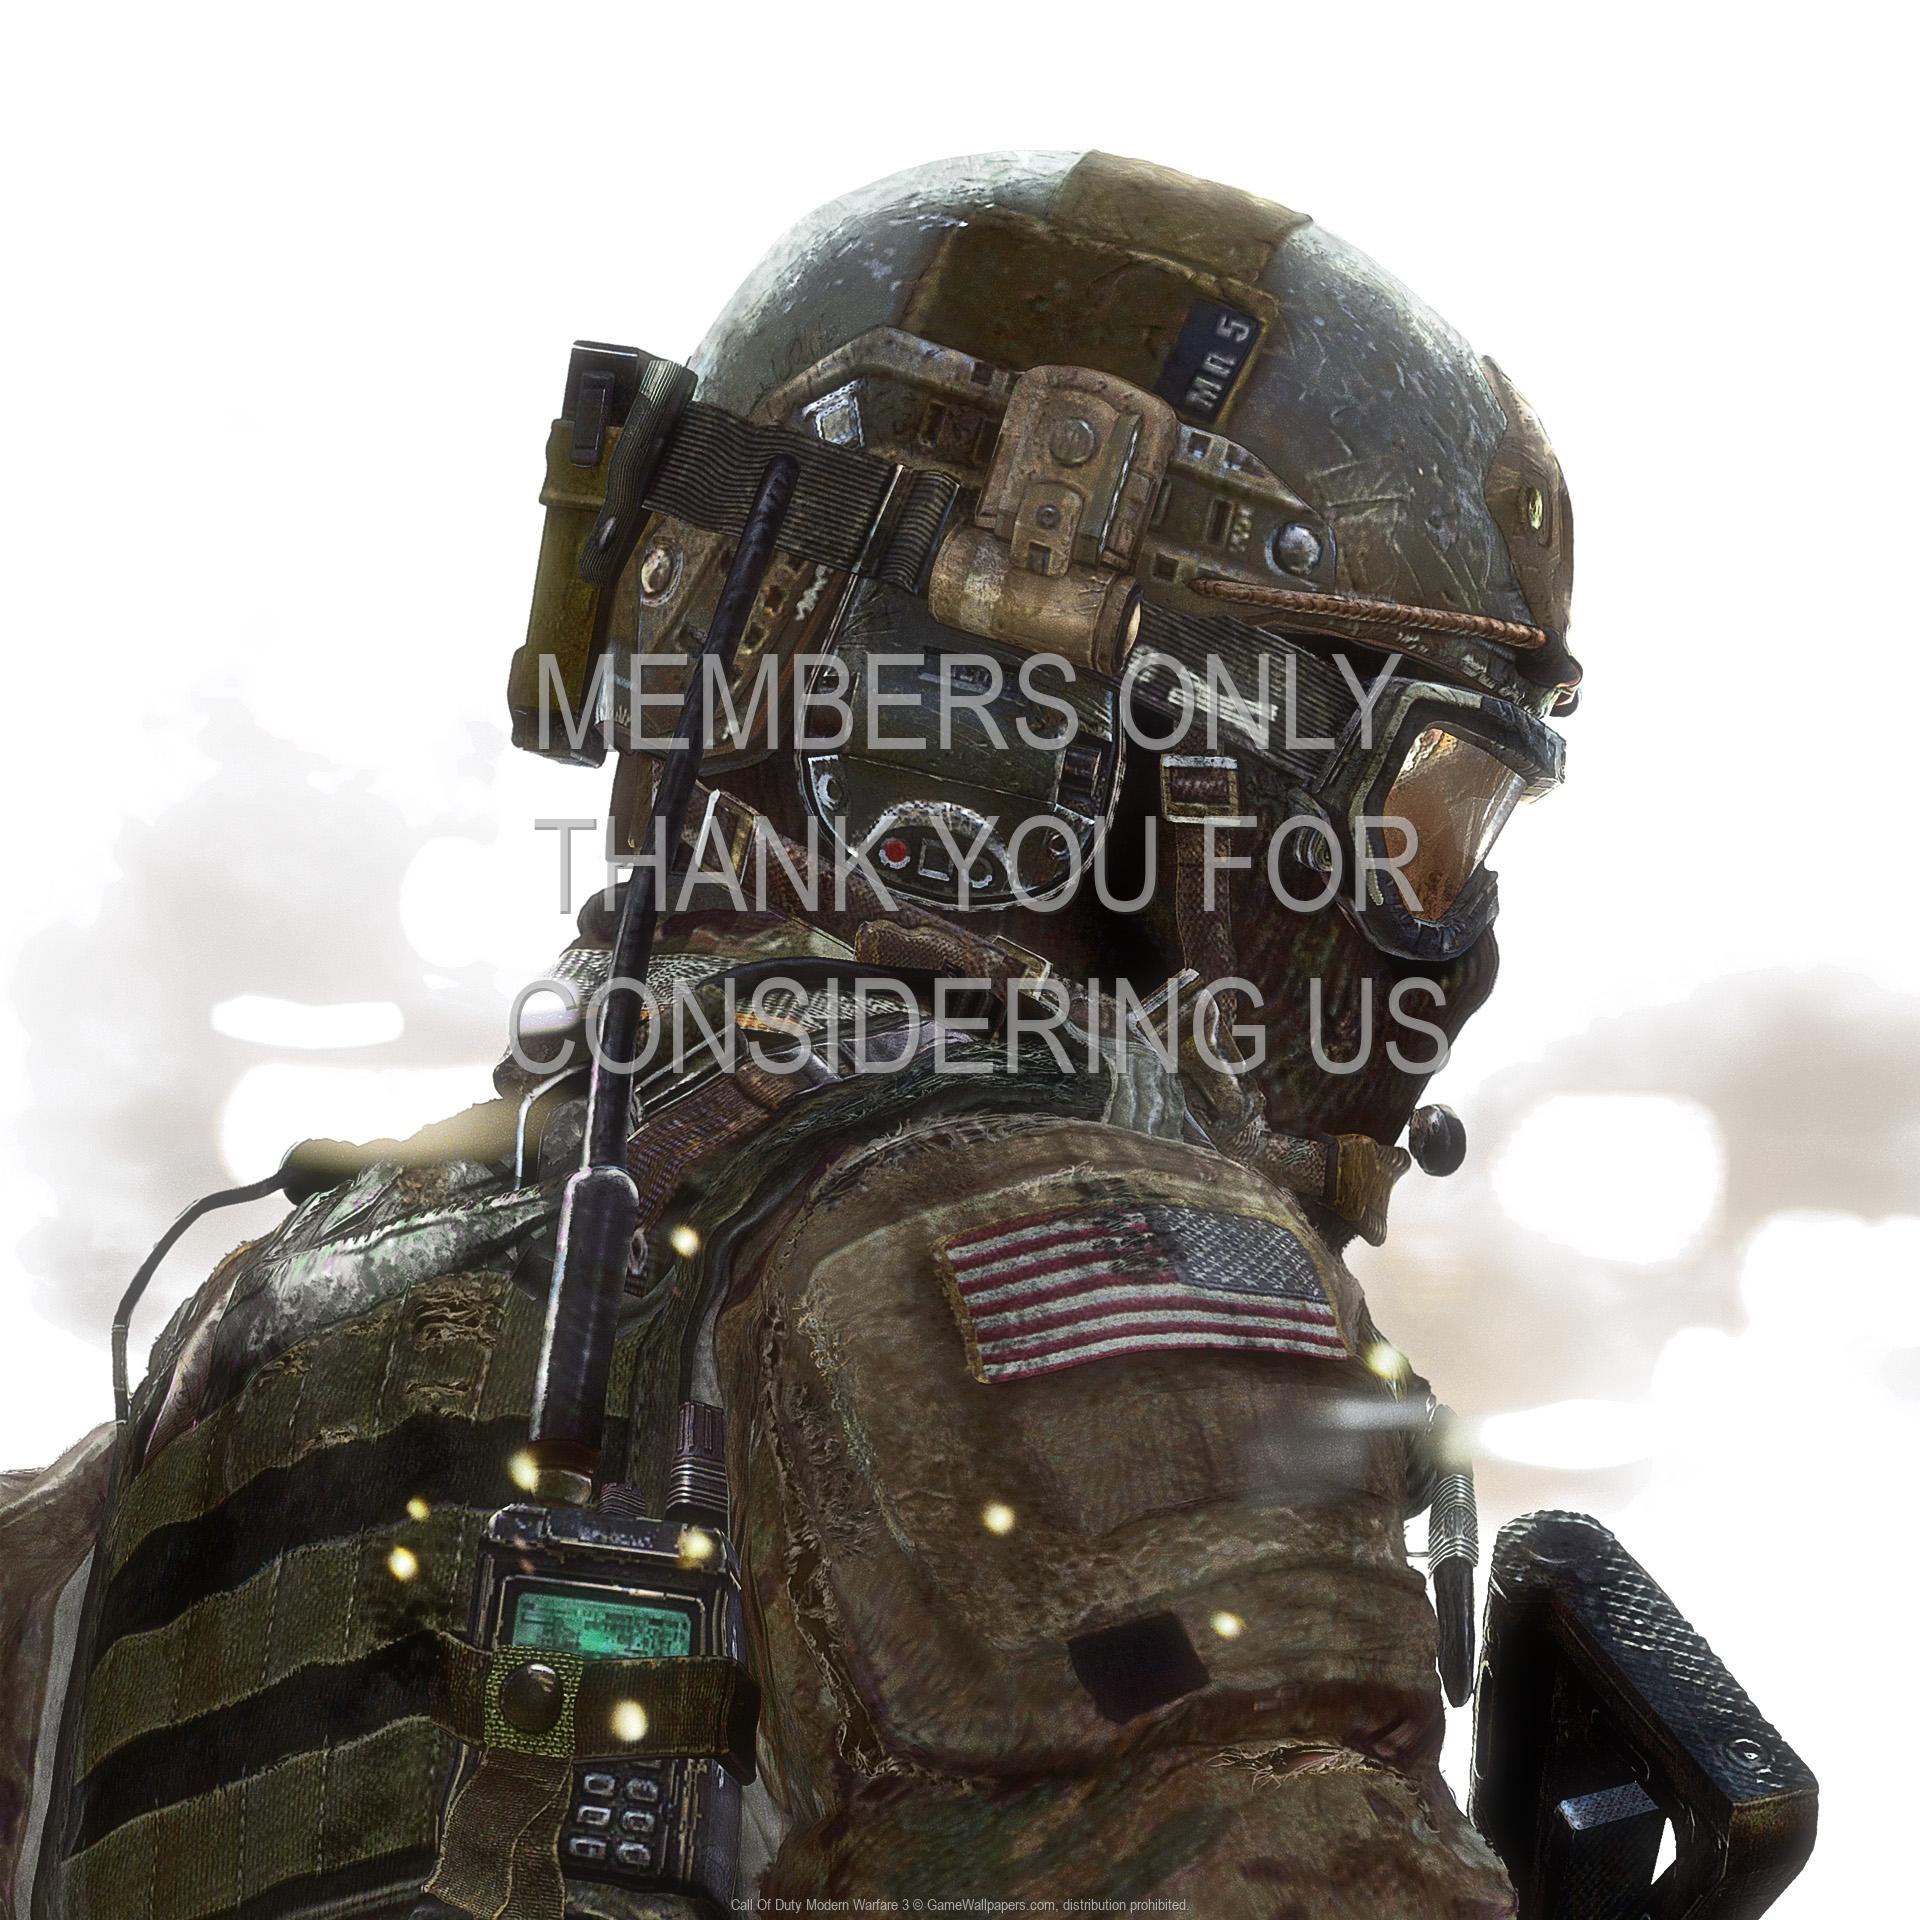 Call Of Duty Modern Warfare 3 Wallpaper 03 1920x1080